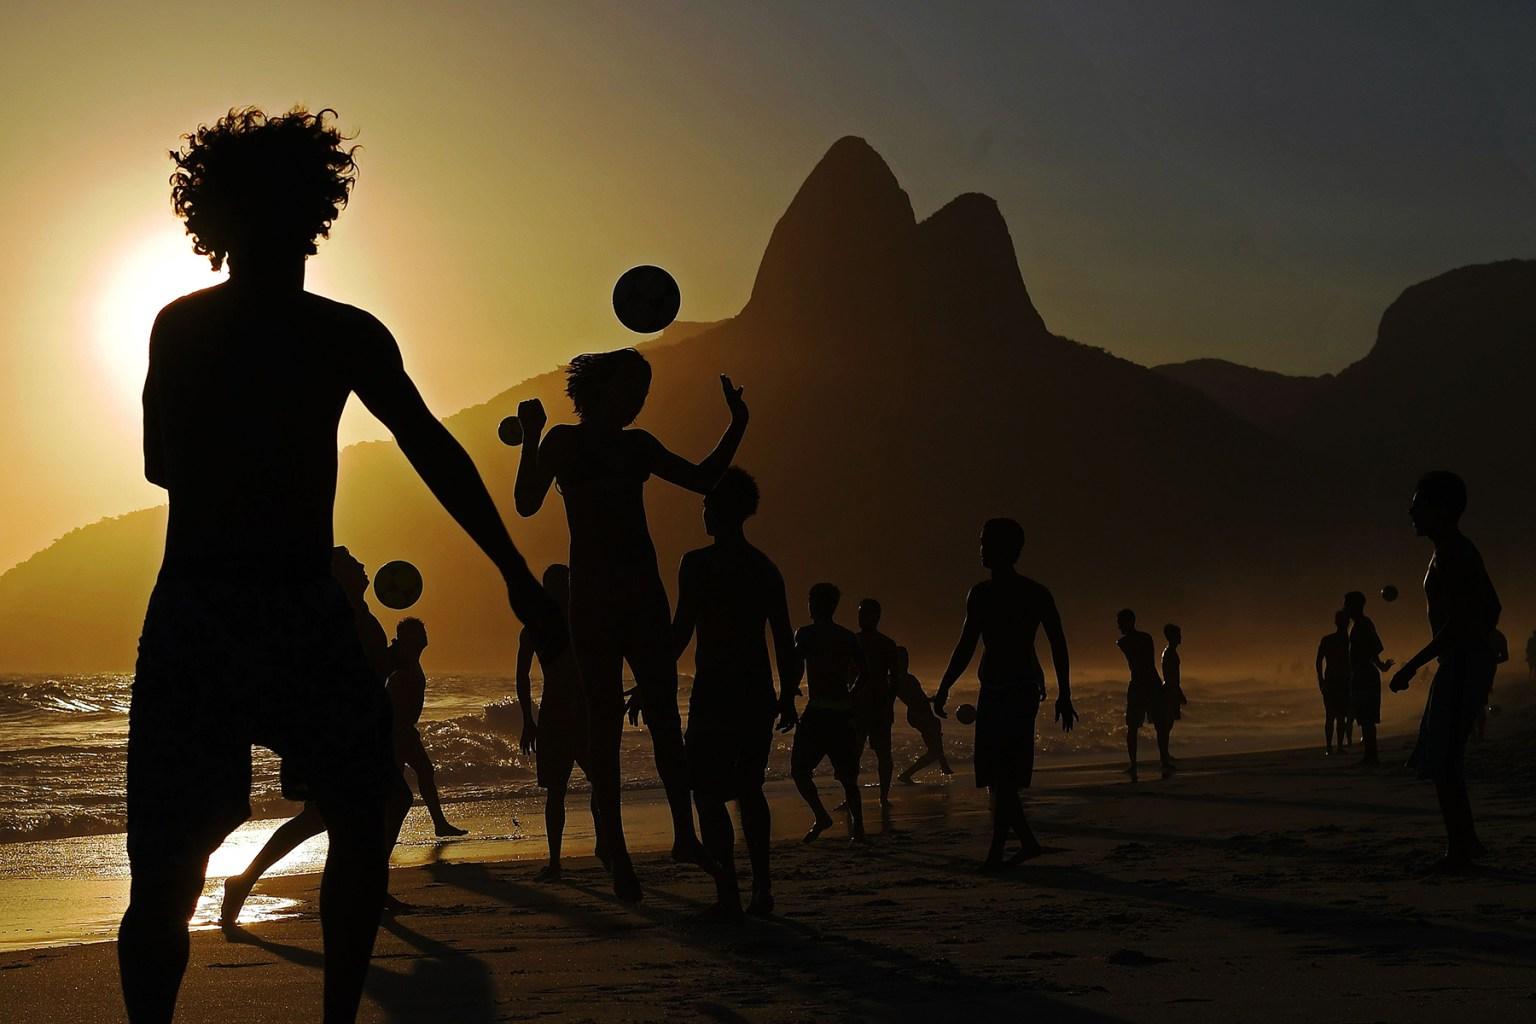 Youth play football at Ipanema beach in Rio de Janeiro, Brazil, on Nov. 13. CARL DE SOUZA/AFP/Getty Images